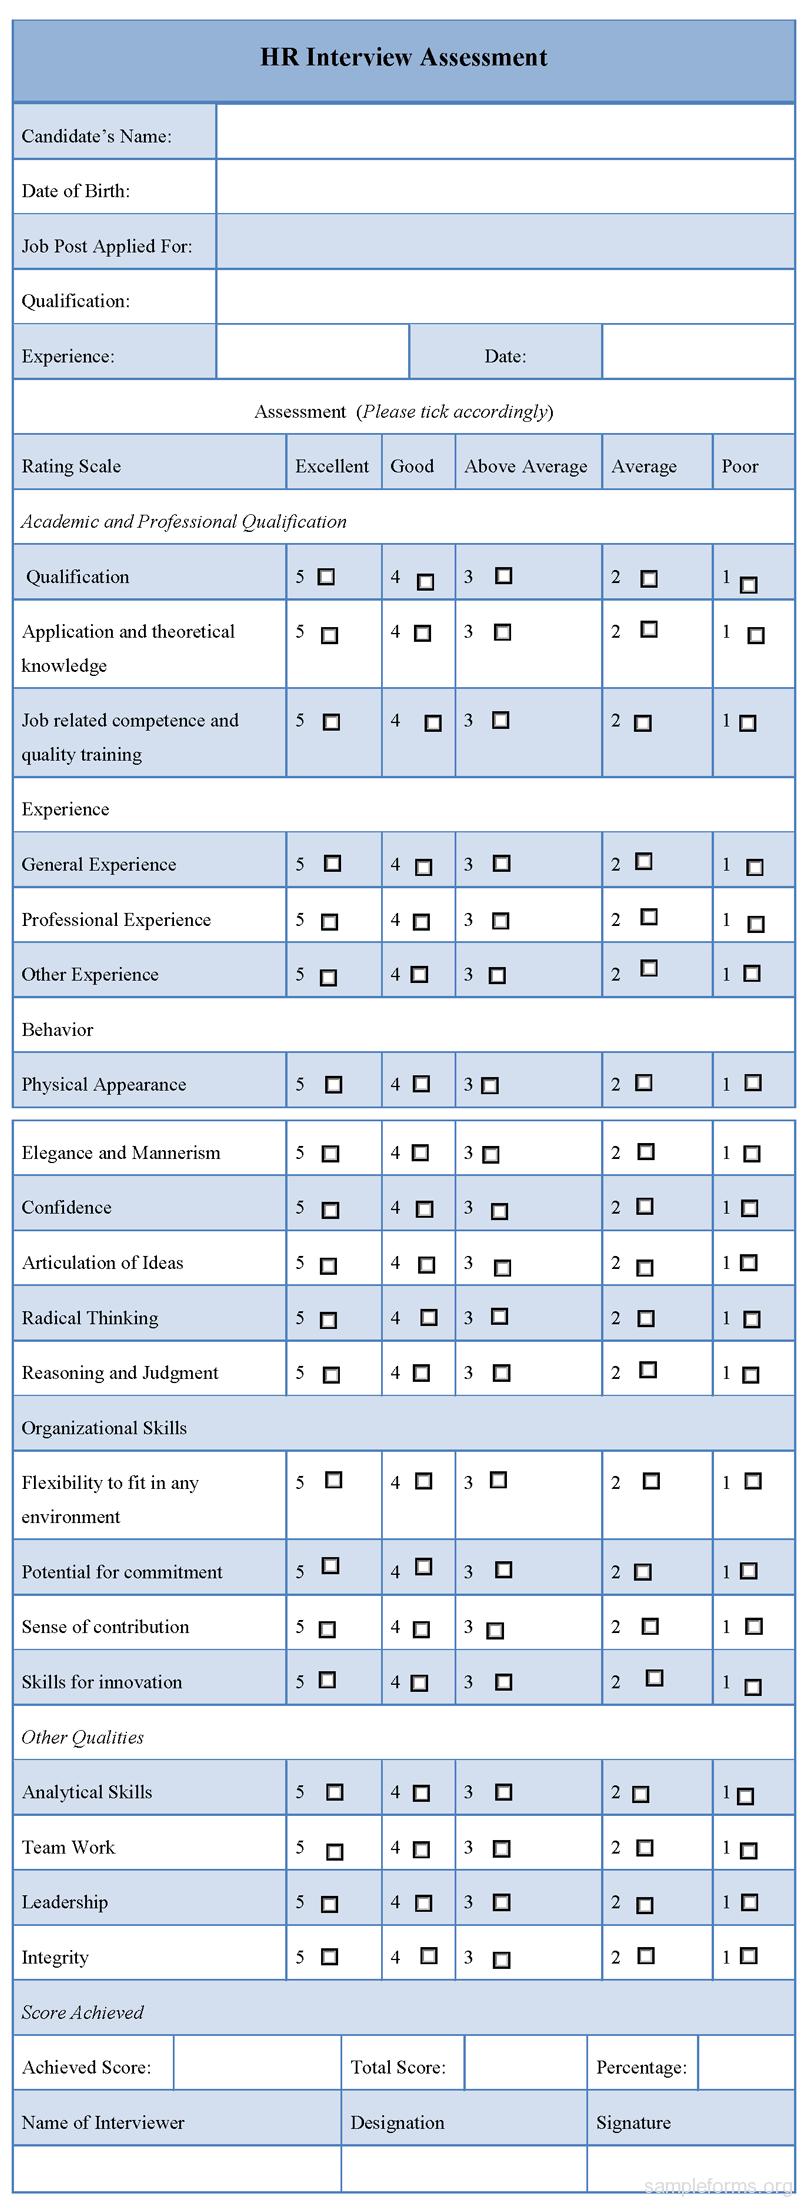 HR Interview Assessment Form   forms   Pinterest   Hr interview